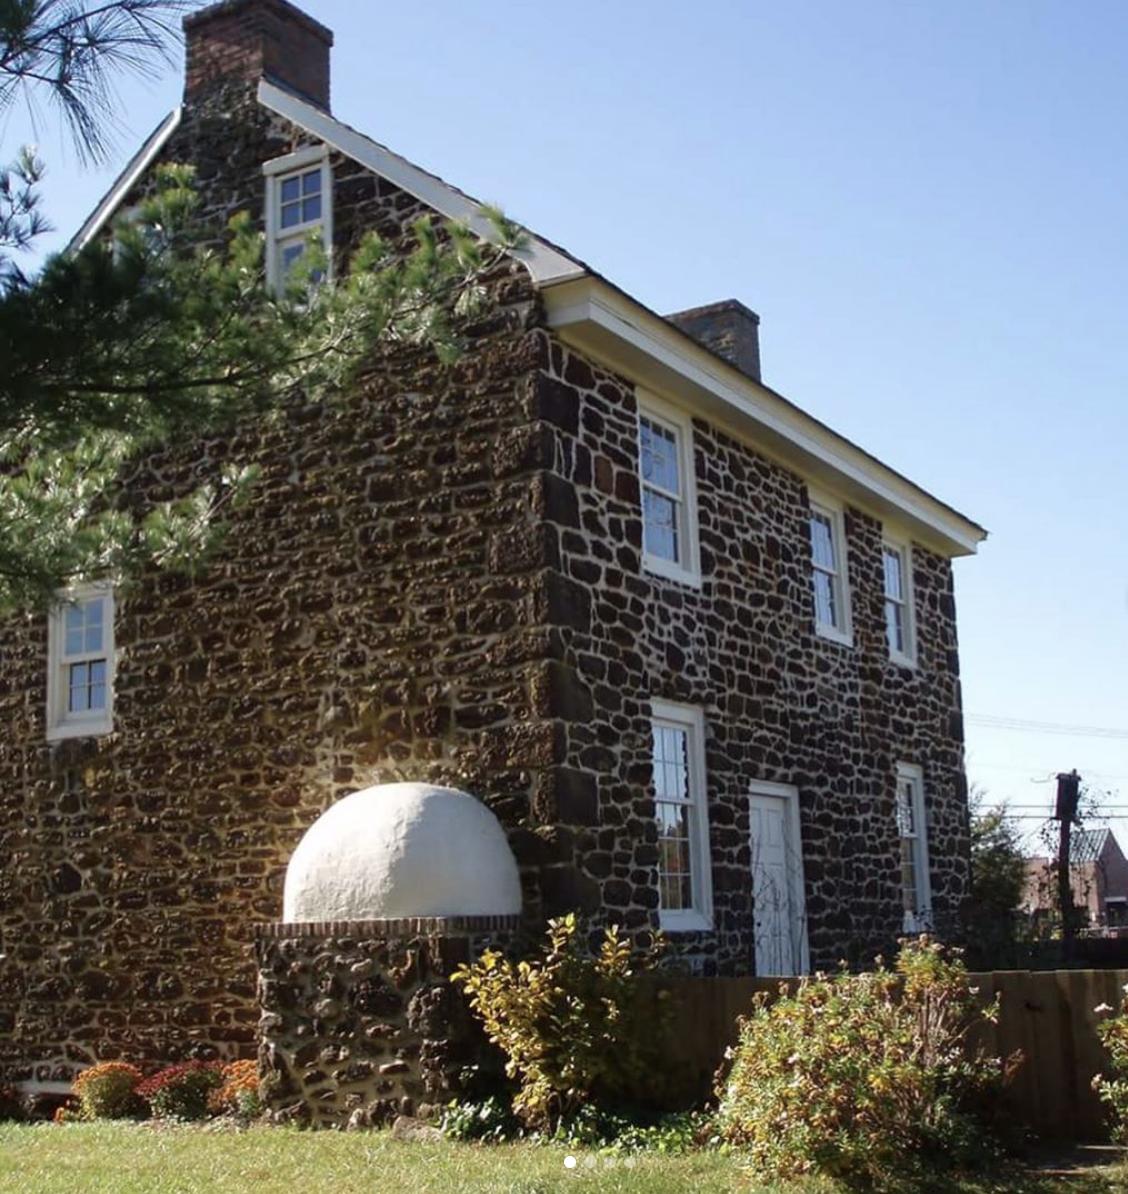 Historic brick building in Washington Township, NH